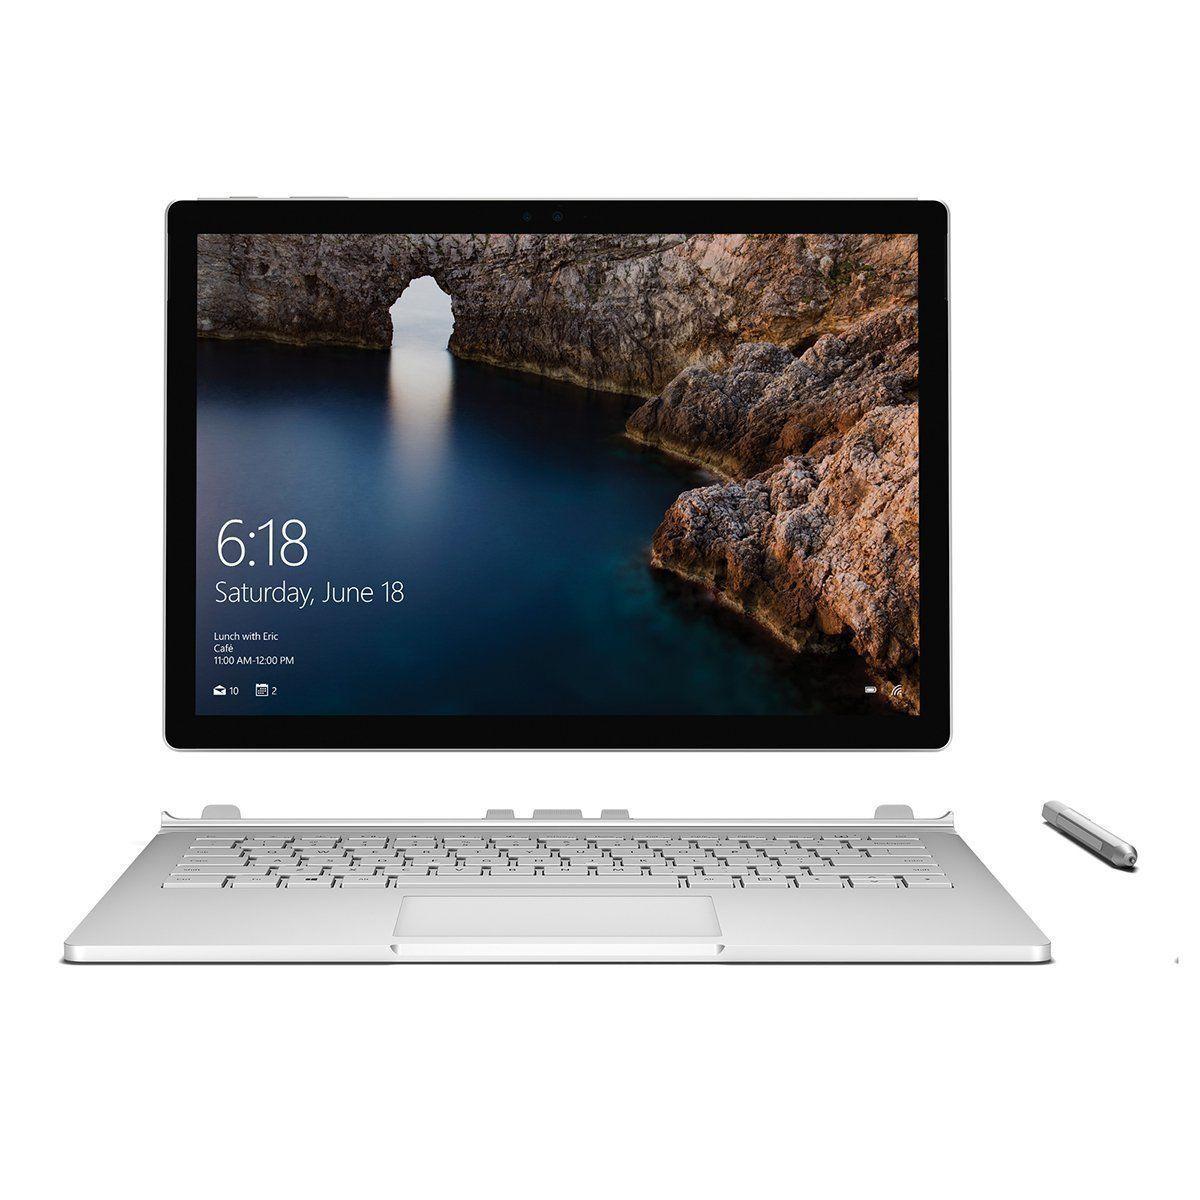 Microsoft Surface Book 135 Inch Intel I5 6300u 24ghz 128gb Ssd 8gb Pro 4 Core 4gb Windows 10 Silver Win